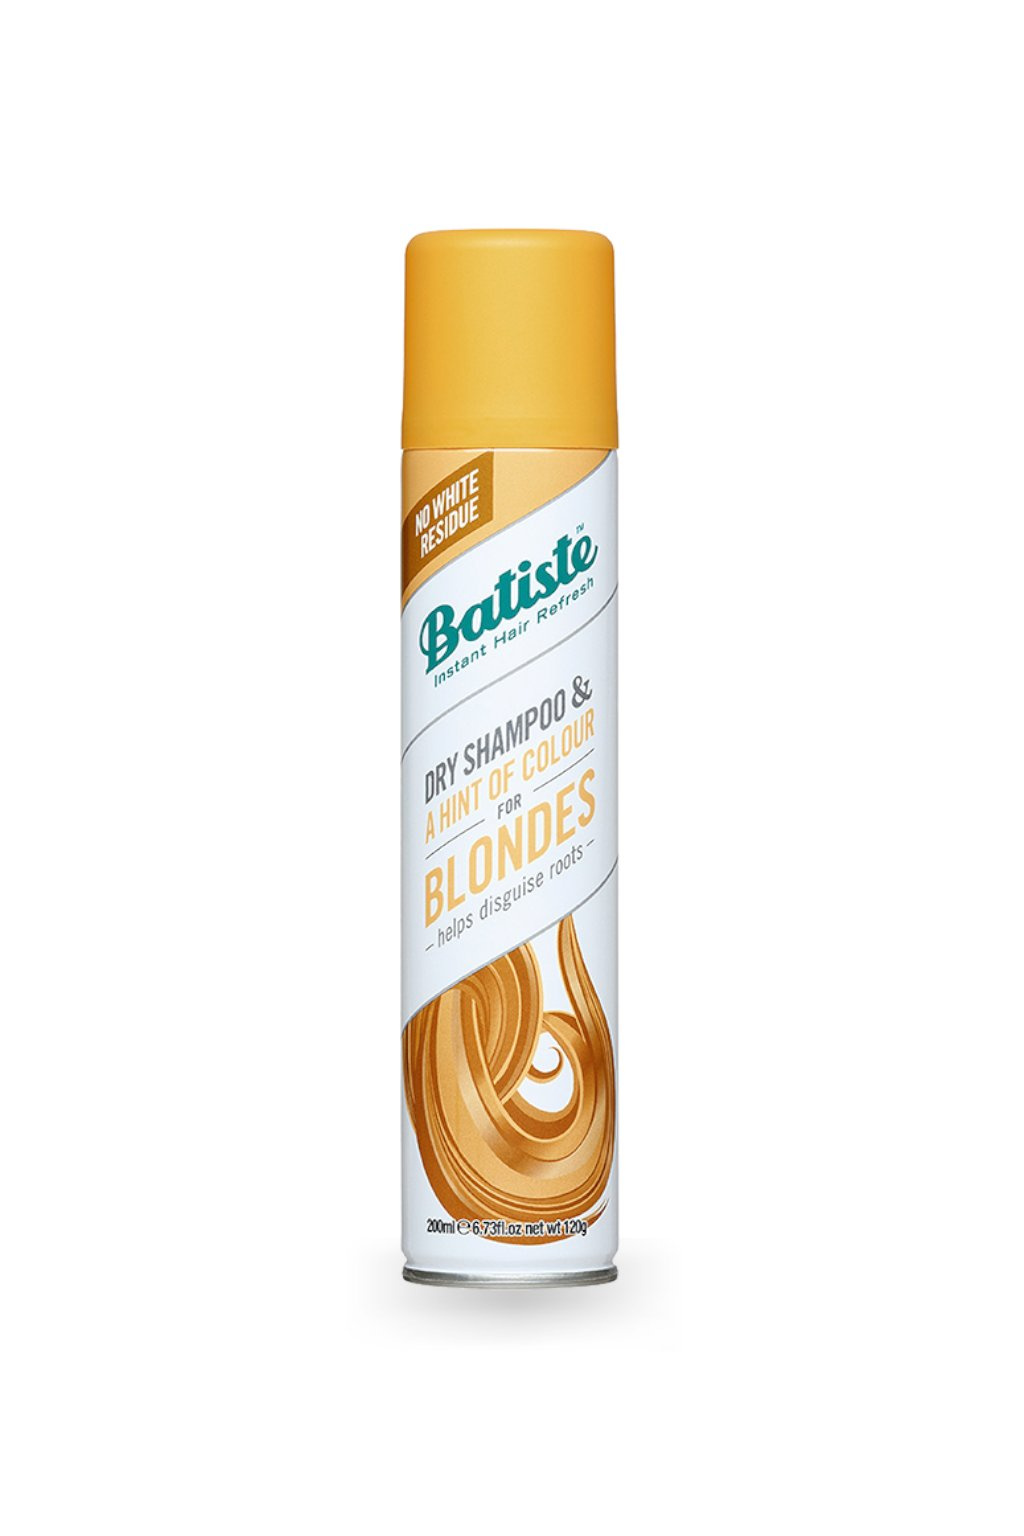 Batiste Dry Shampoo blondes 1024x1364